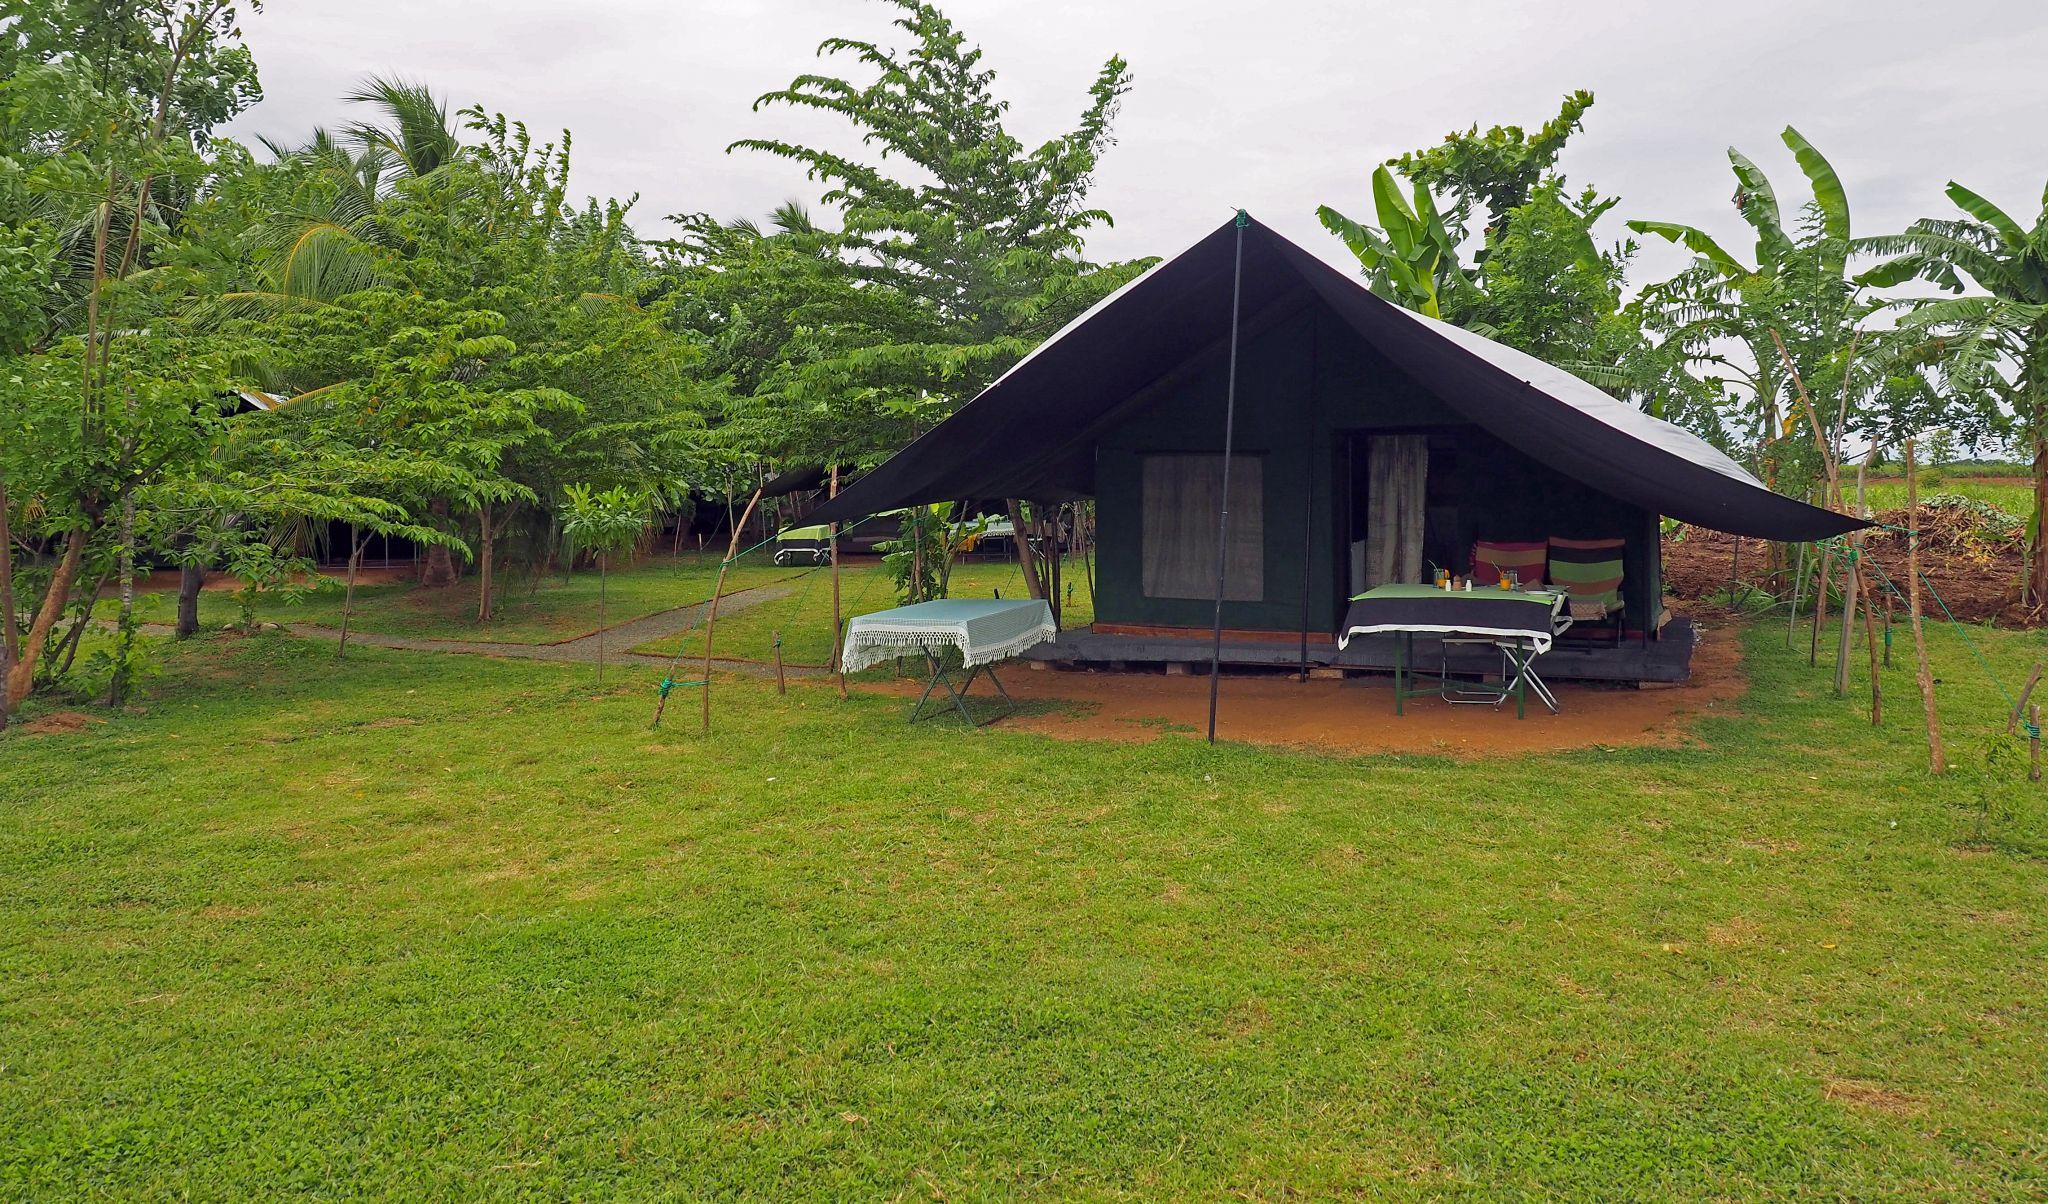 Master Campers Udawalawe Tent